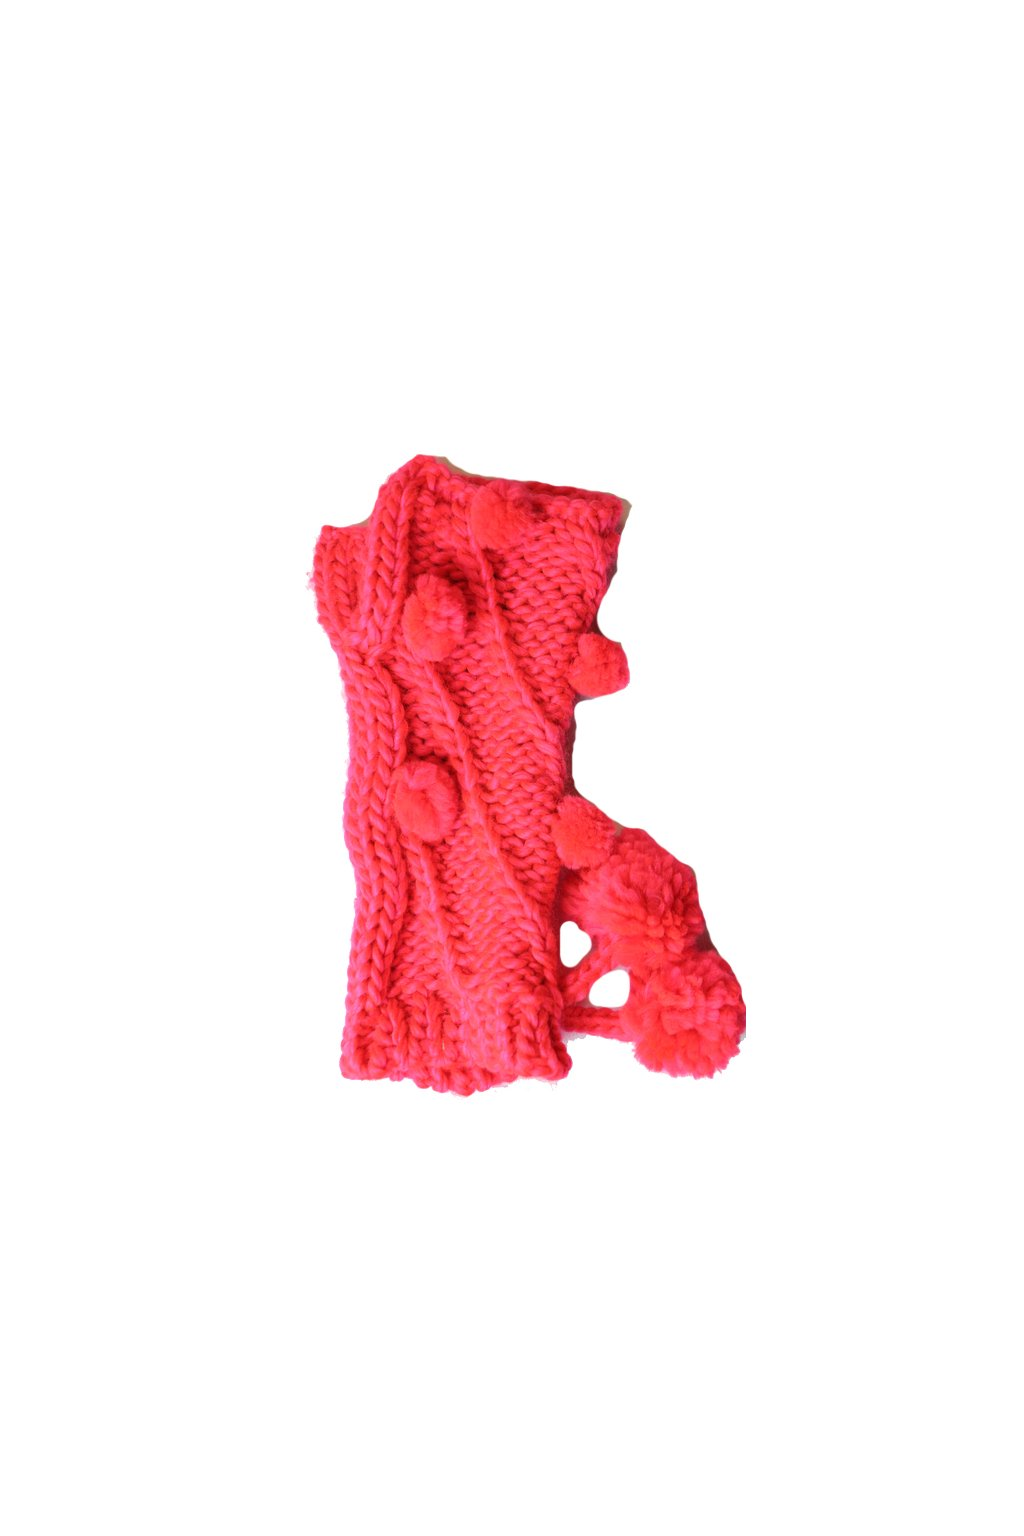 JKB035 cervena